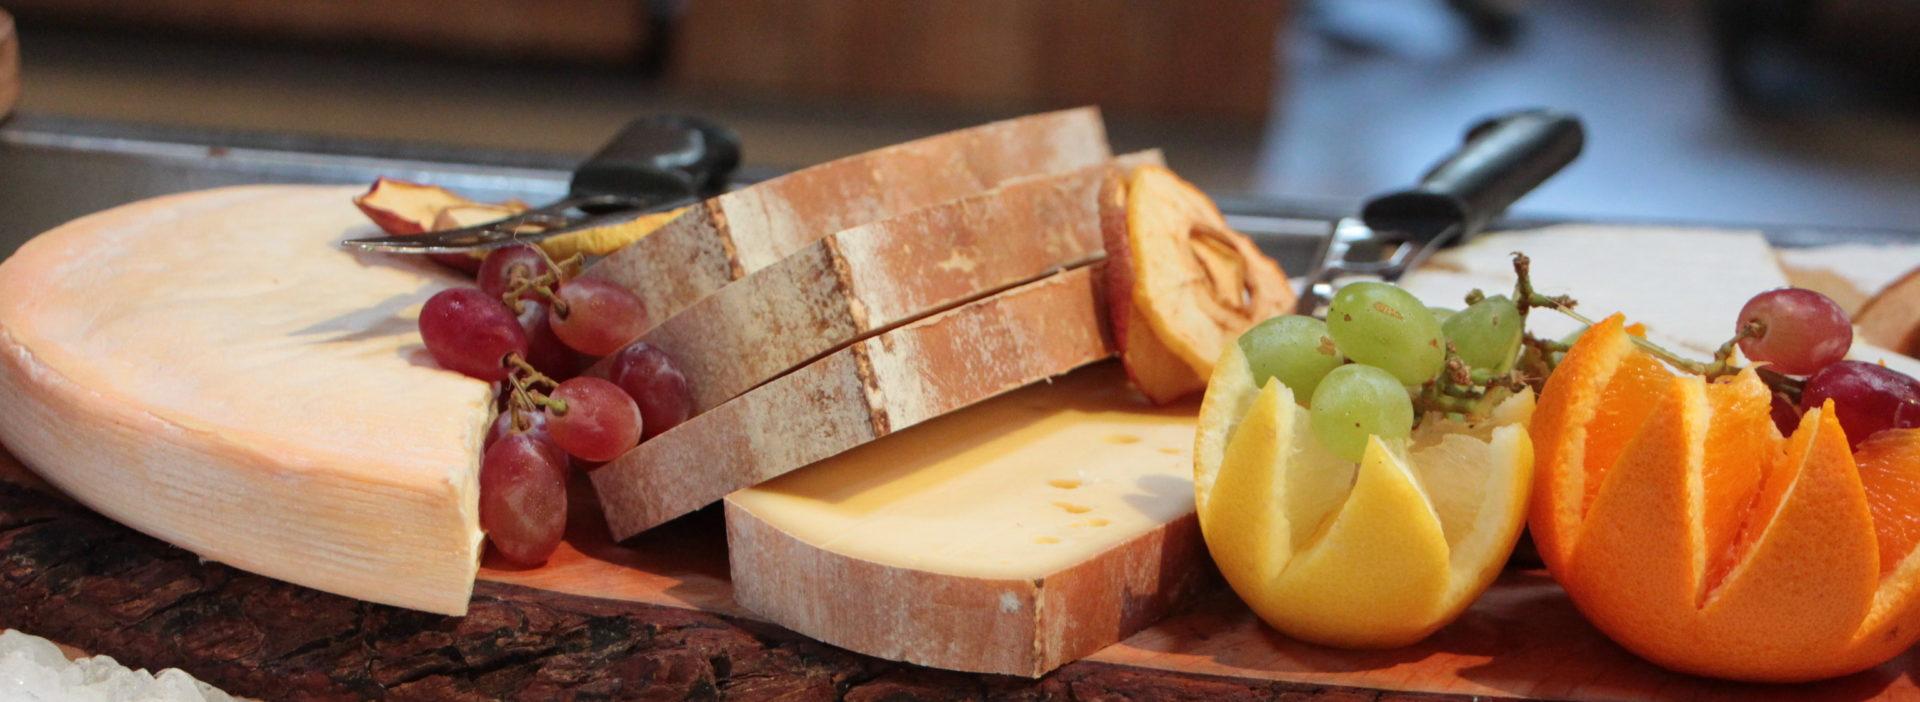 Bächlihof BuureZmorge Käse